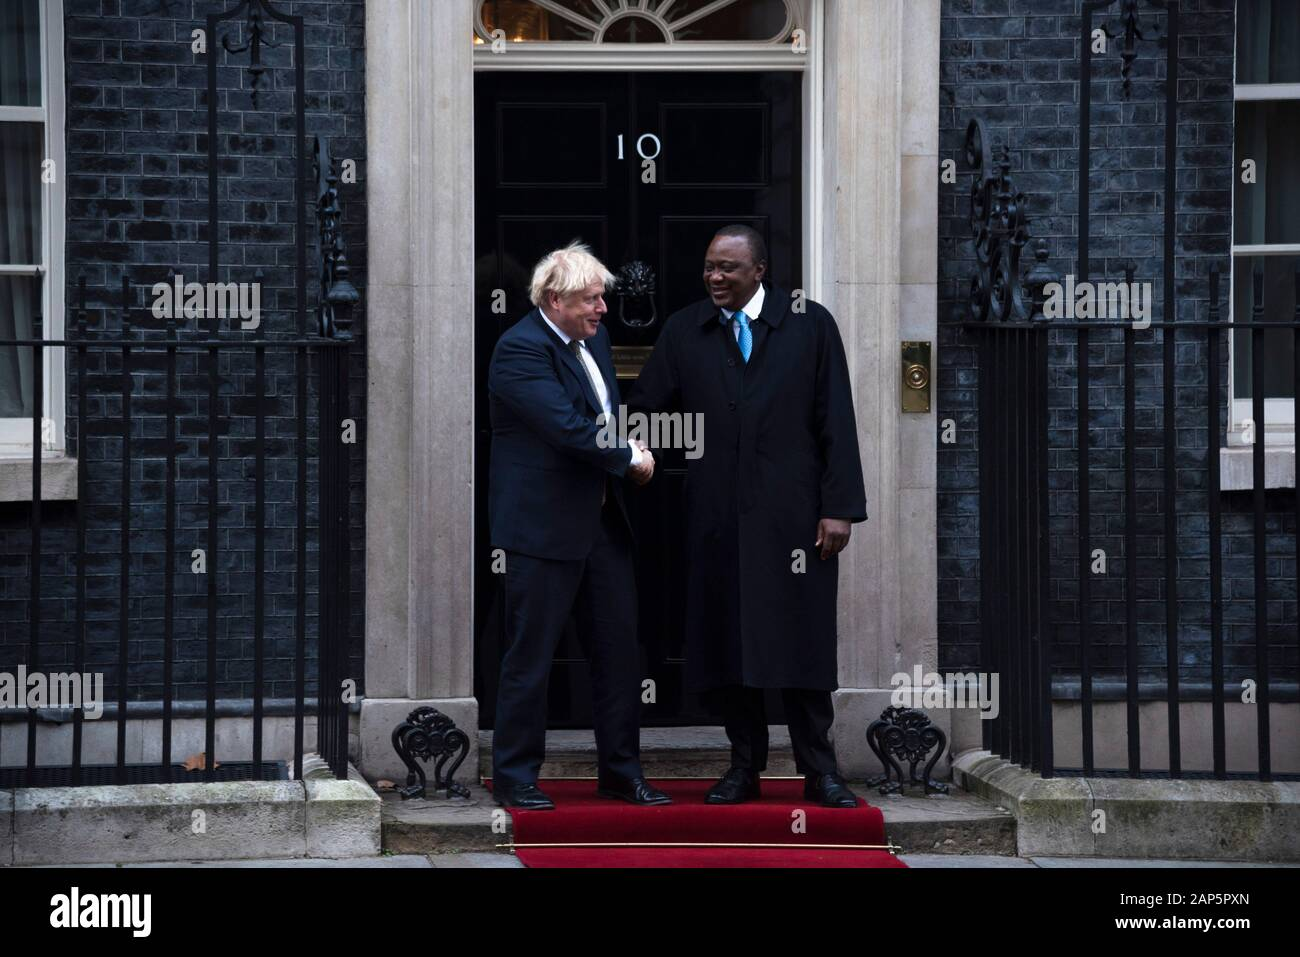 London, UK. 21st Jan, 2020. Prime Minister Boris Johnson greets President of Kenya Uhuru Kenyatta in Downing Street. Credit: claire doherty/Alamy Live News Stock Photo